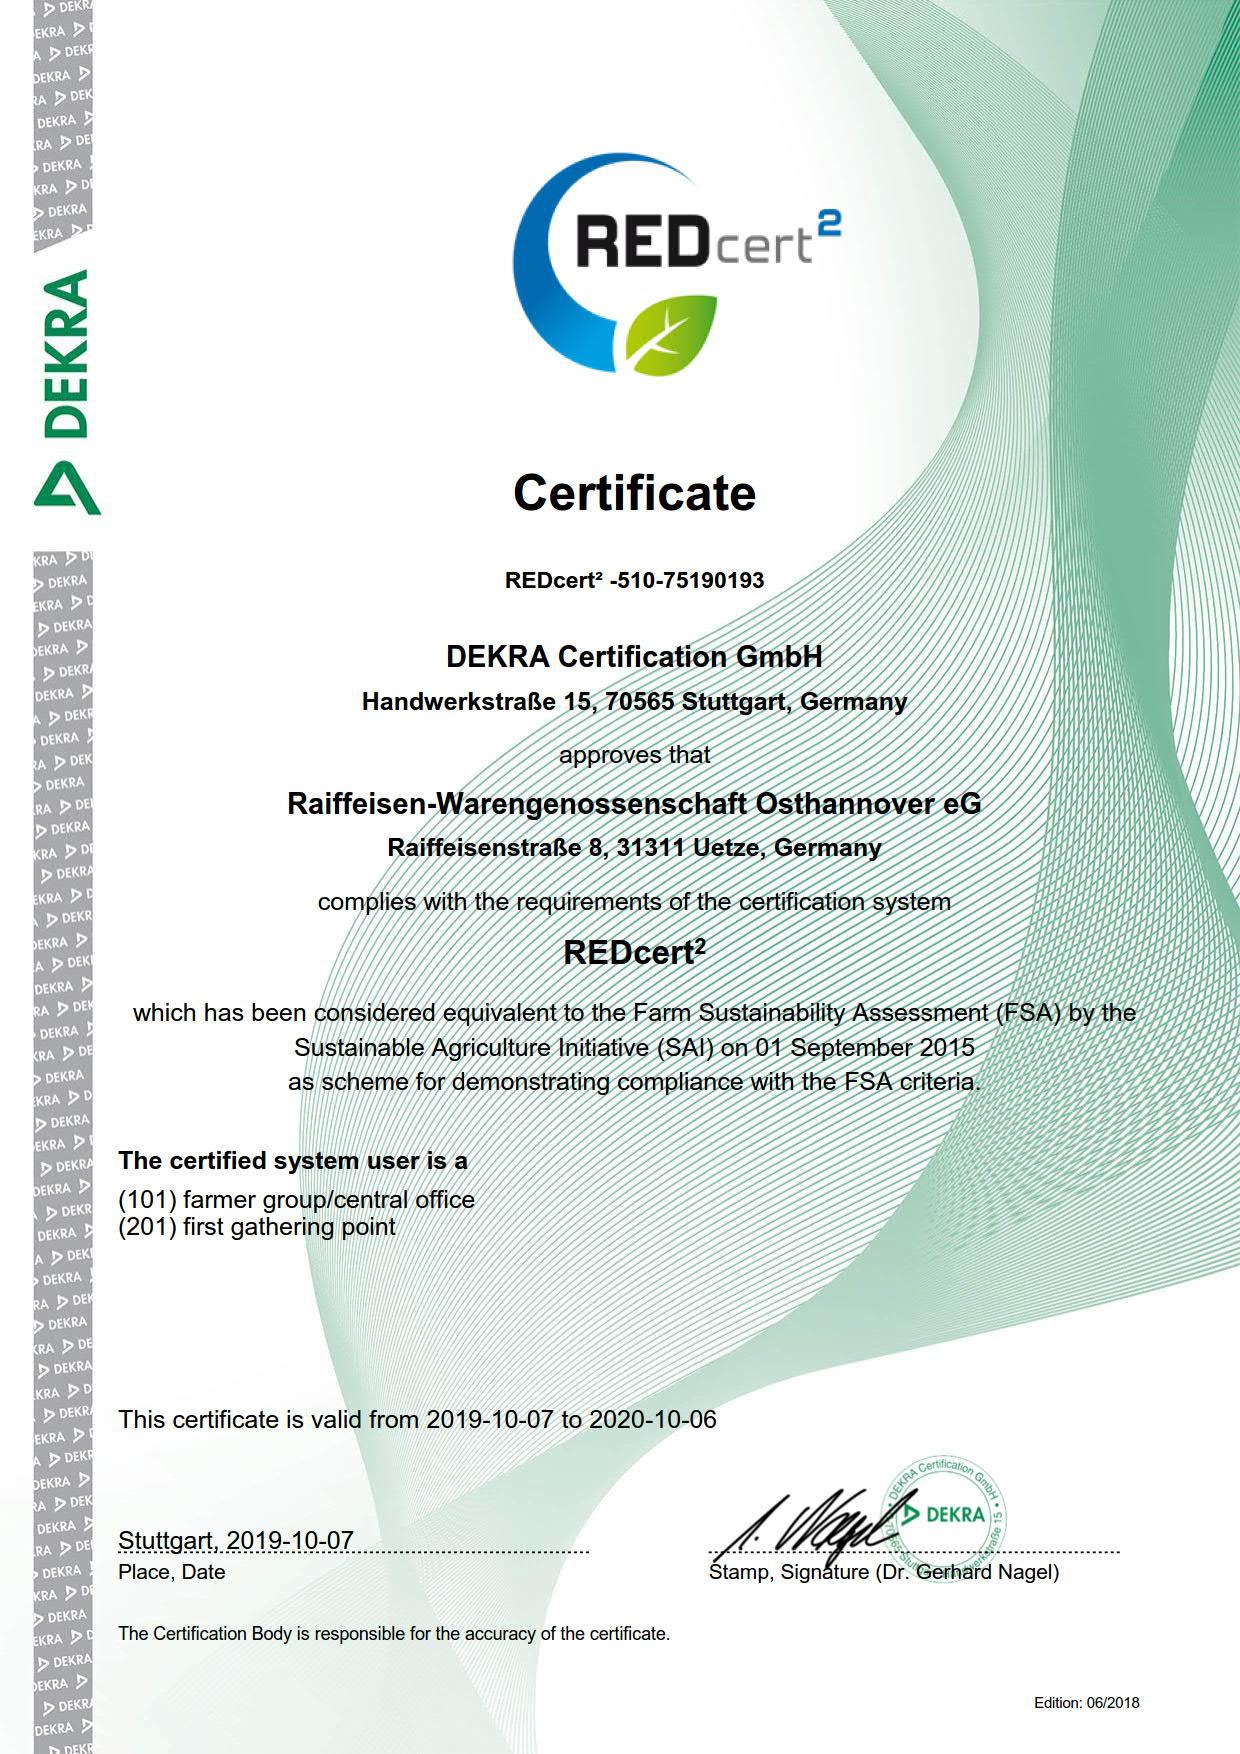 Zertifikate/2019_ZA_Zertifikat_REDcert2-201910-24.jpg